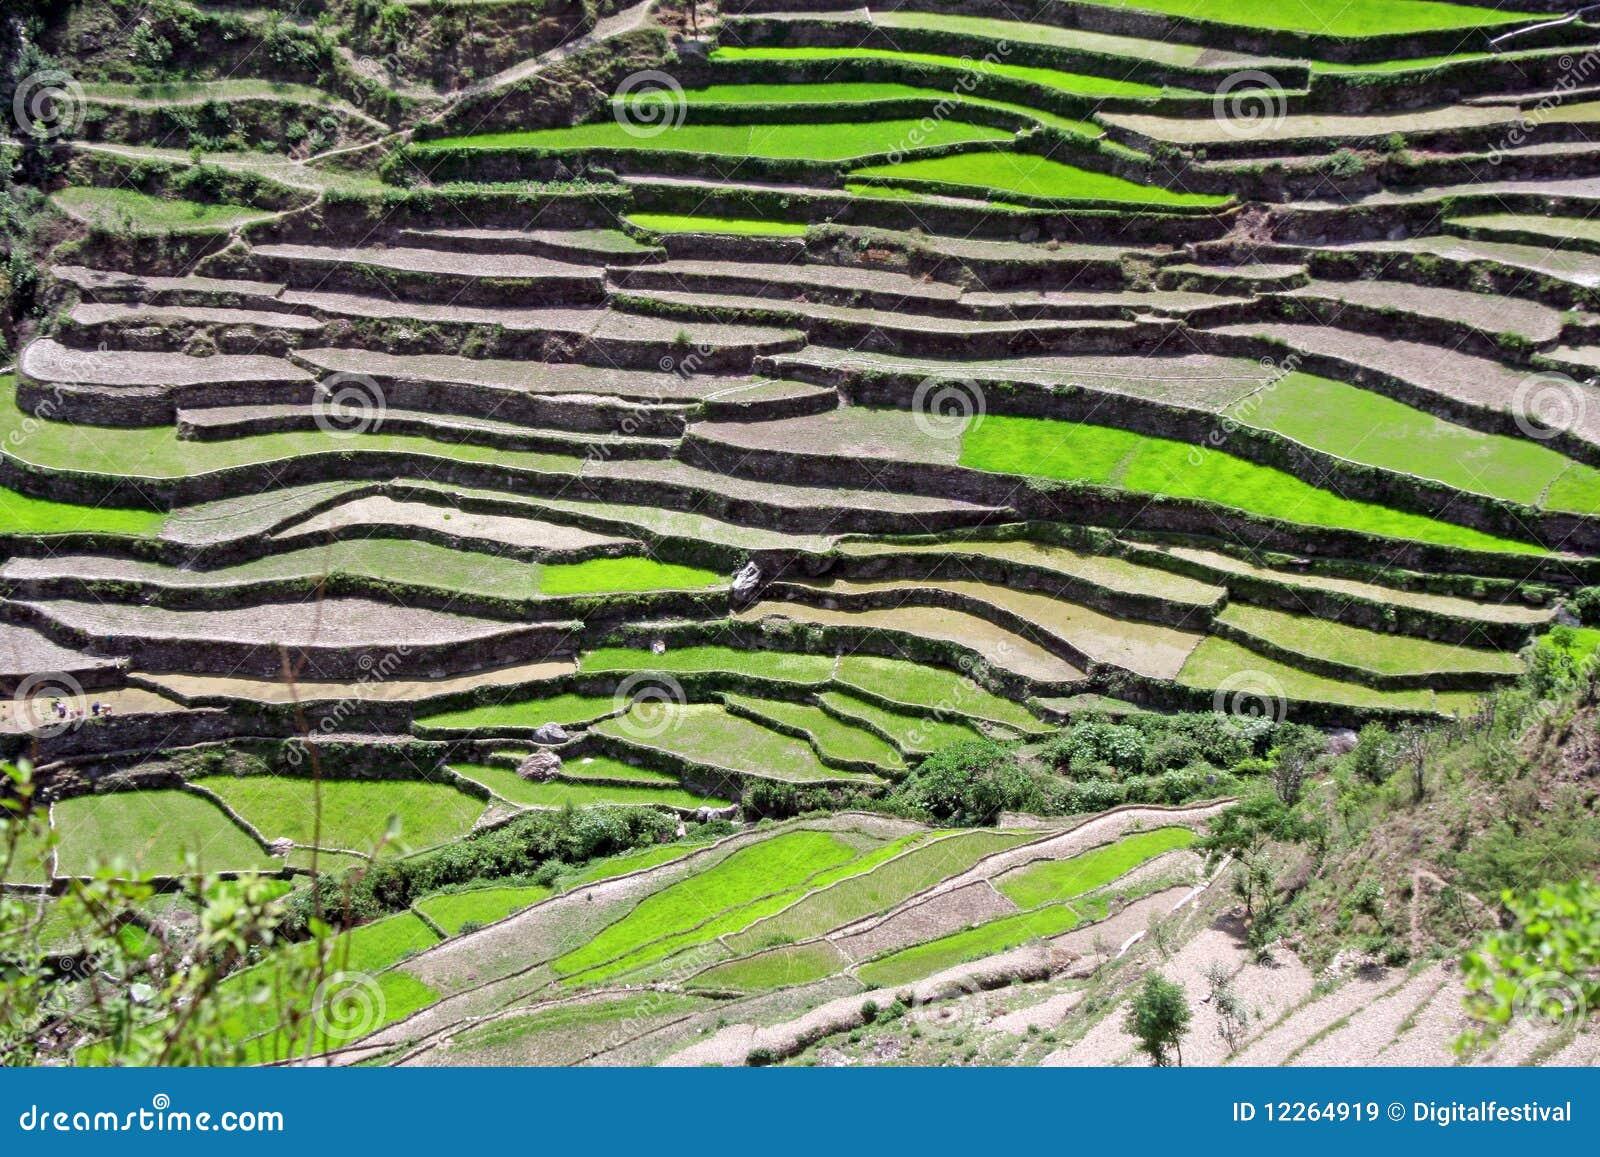 Himalayan steppe paddy farming uttaranchal india royalty for Terrace farming model